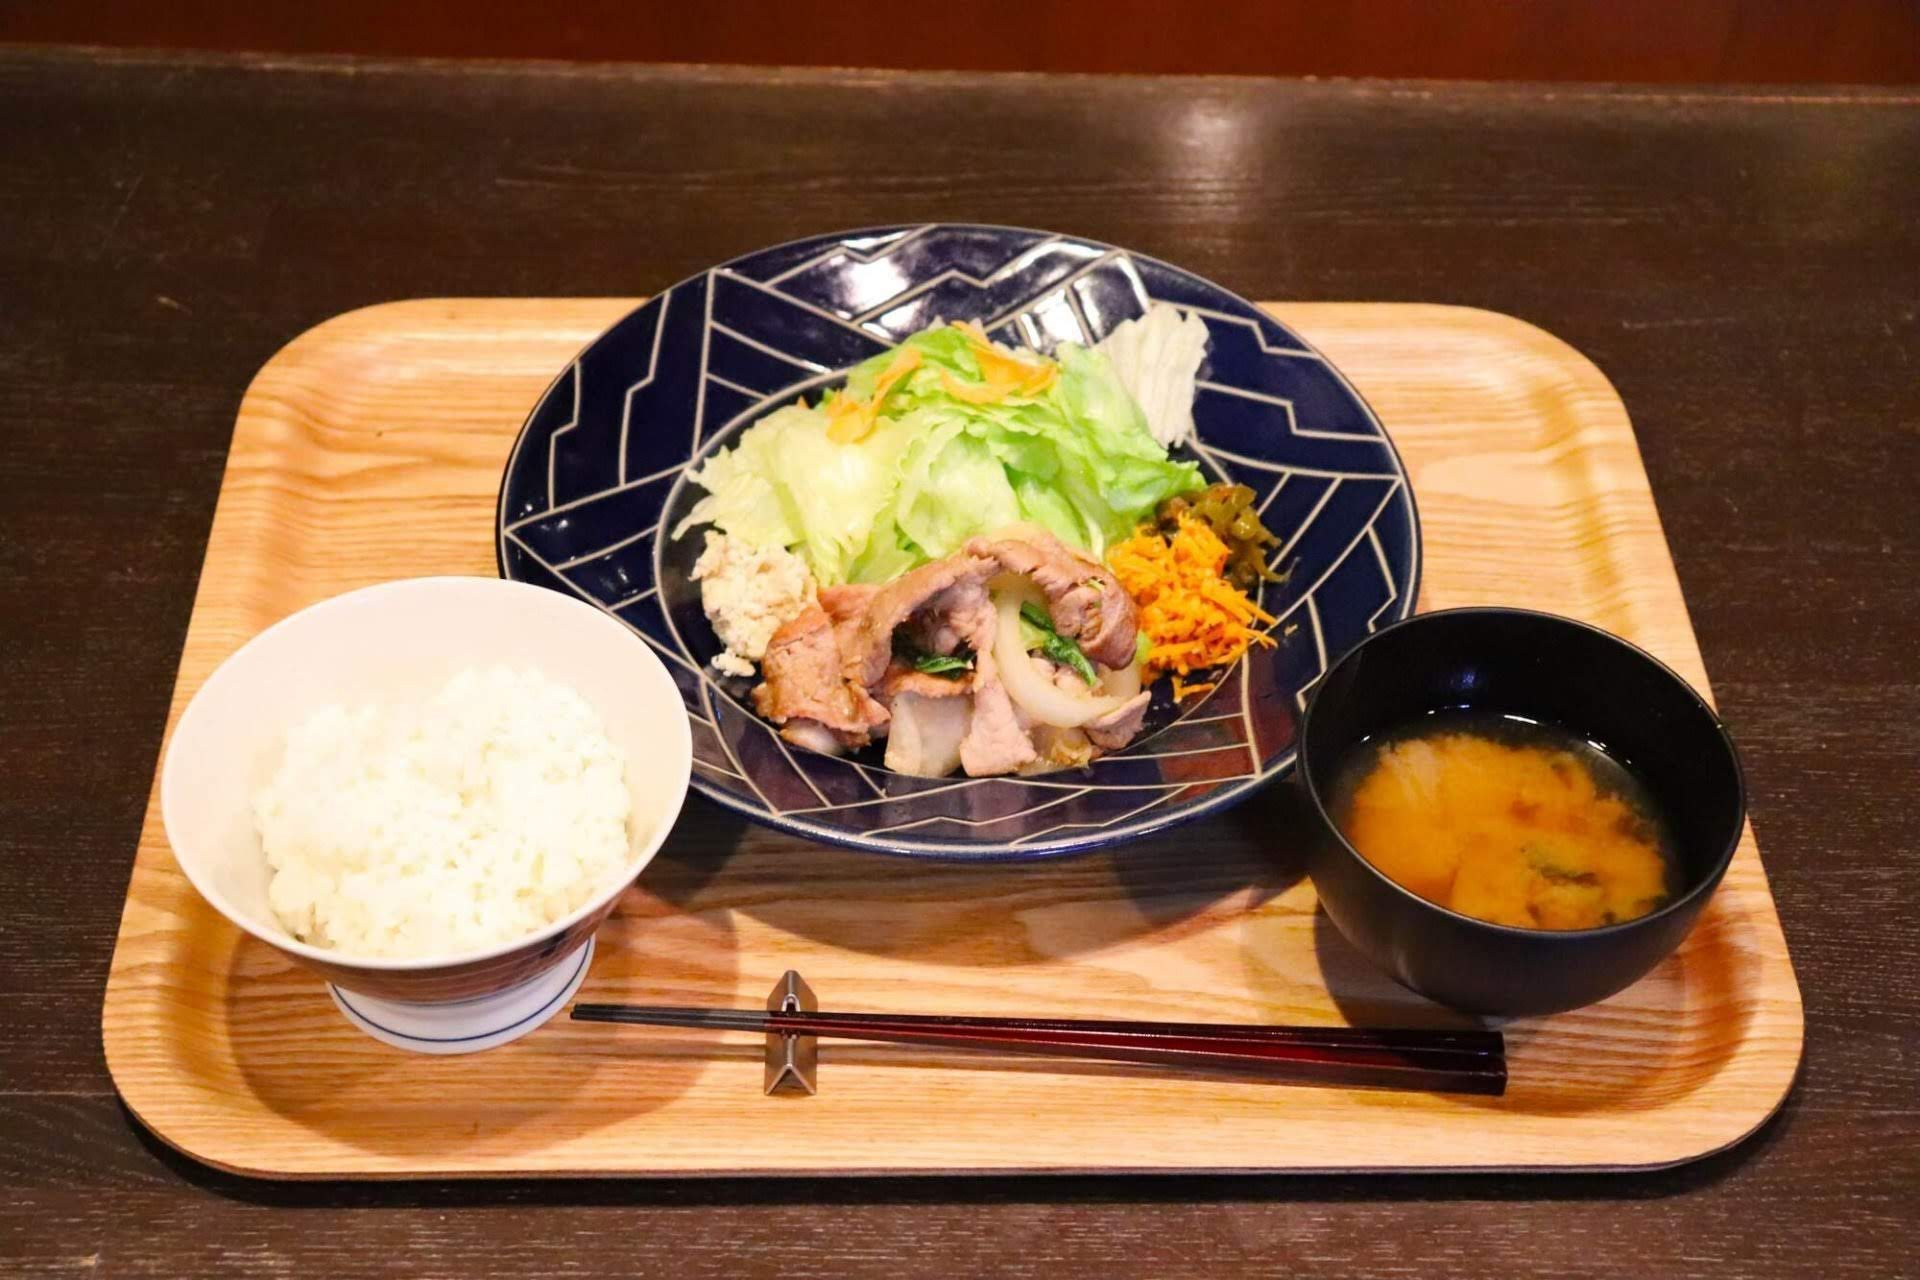 cafe ouchi: 沖縄市 ランチ おすすめ